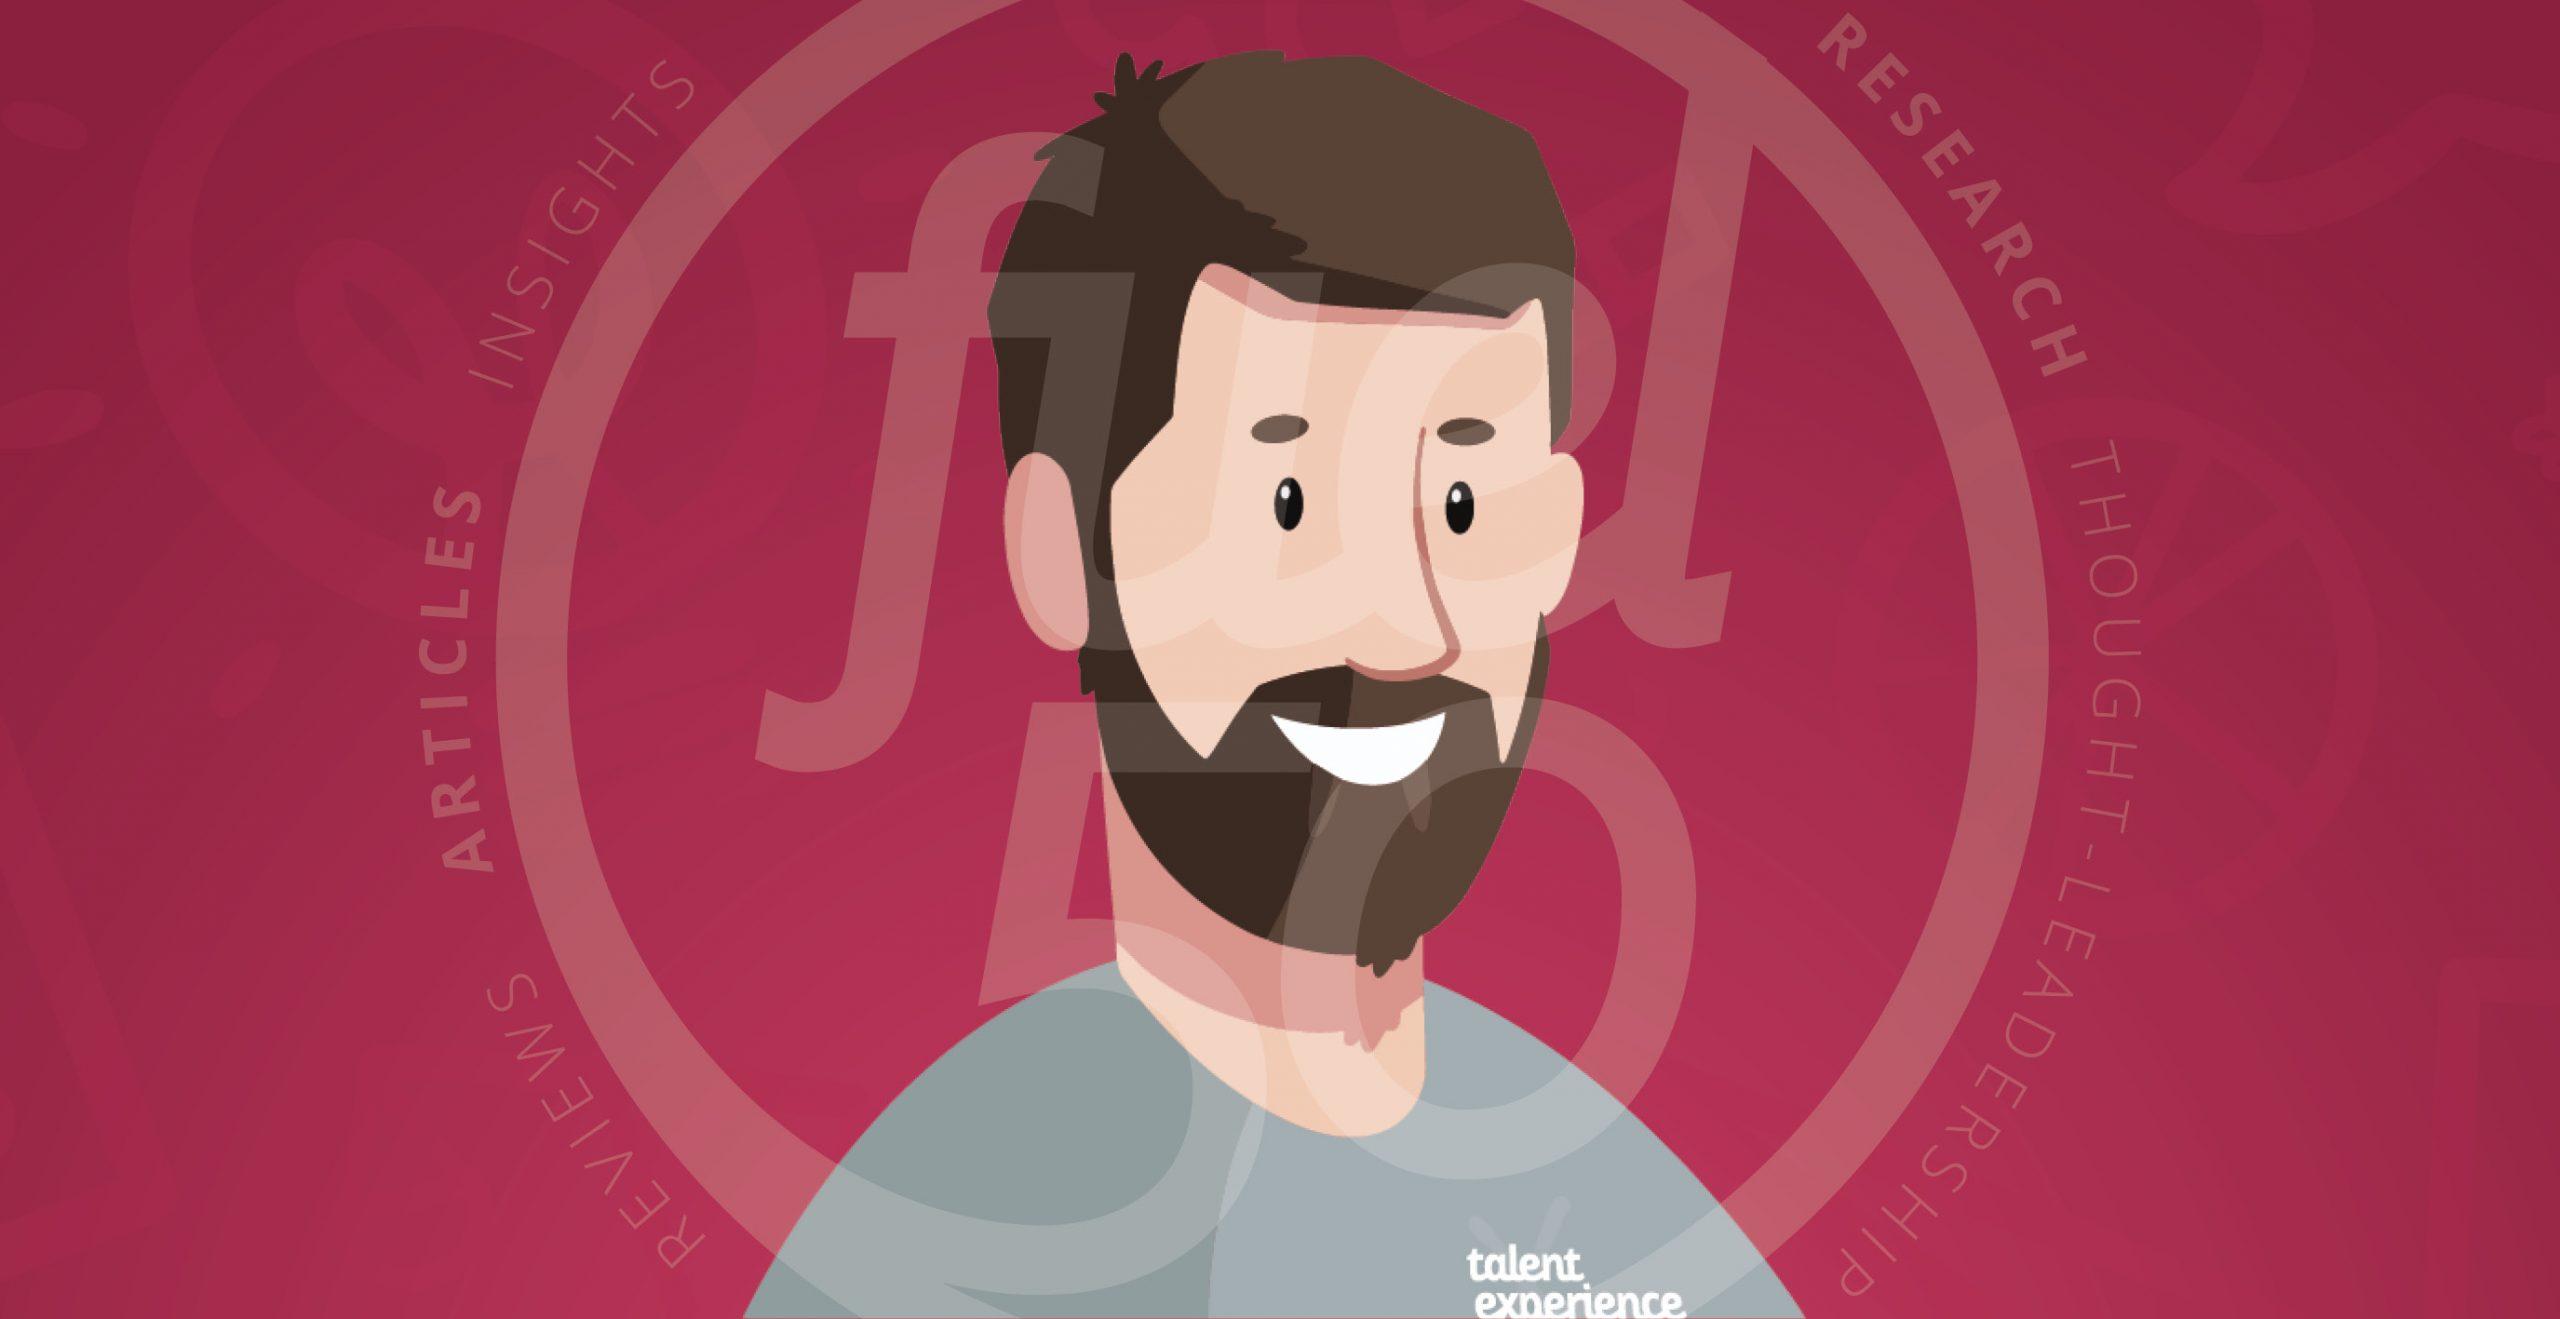 Brent Skinner Caricature Best Practice for Employee Retention Podcast Episode Art